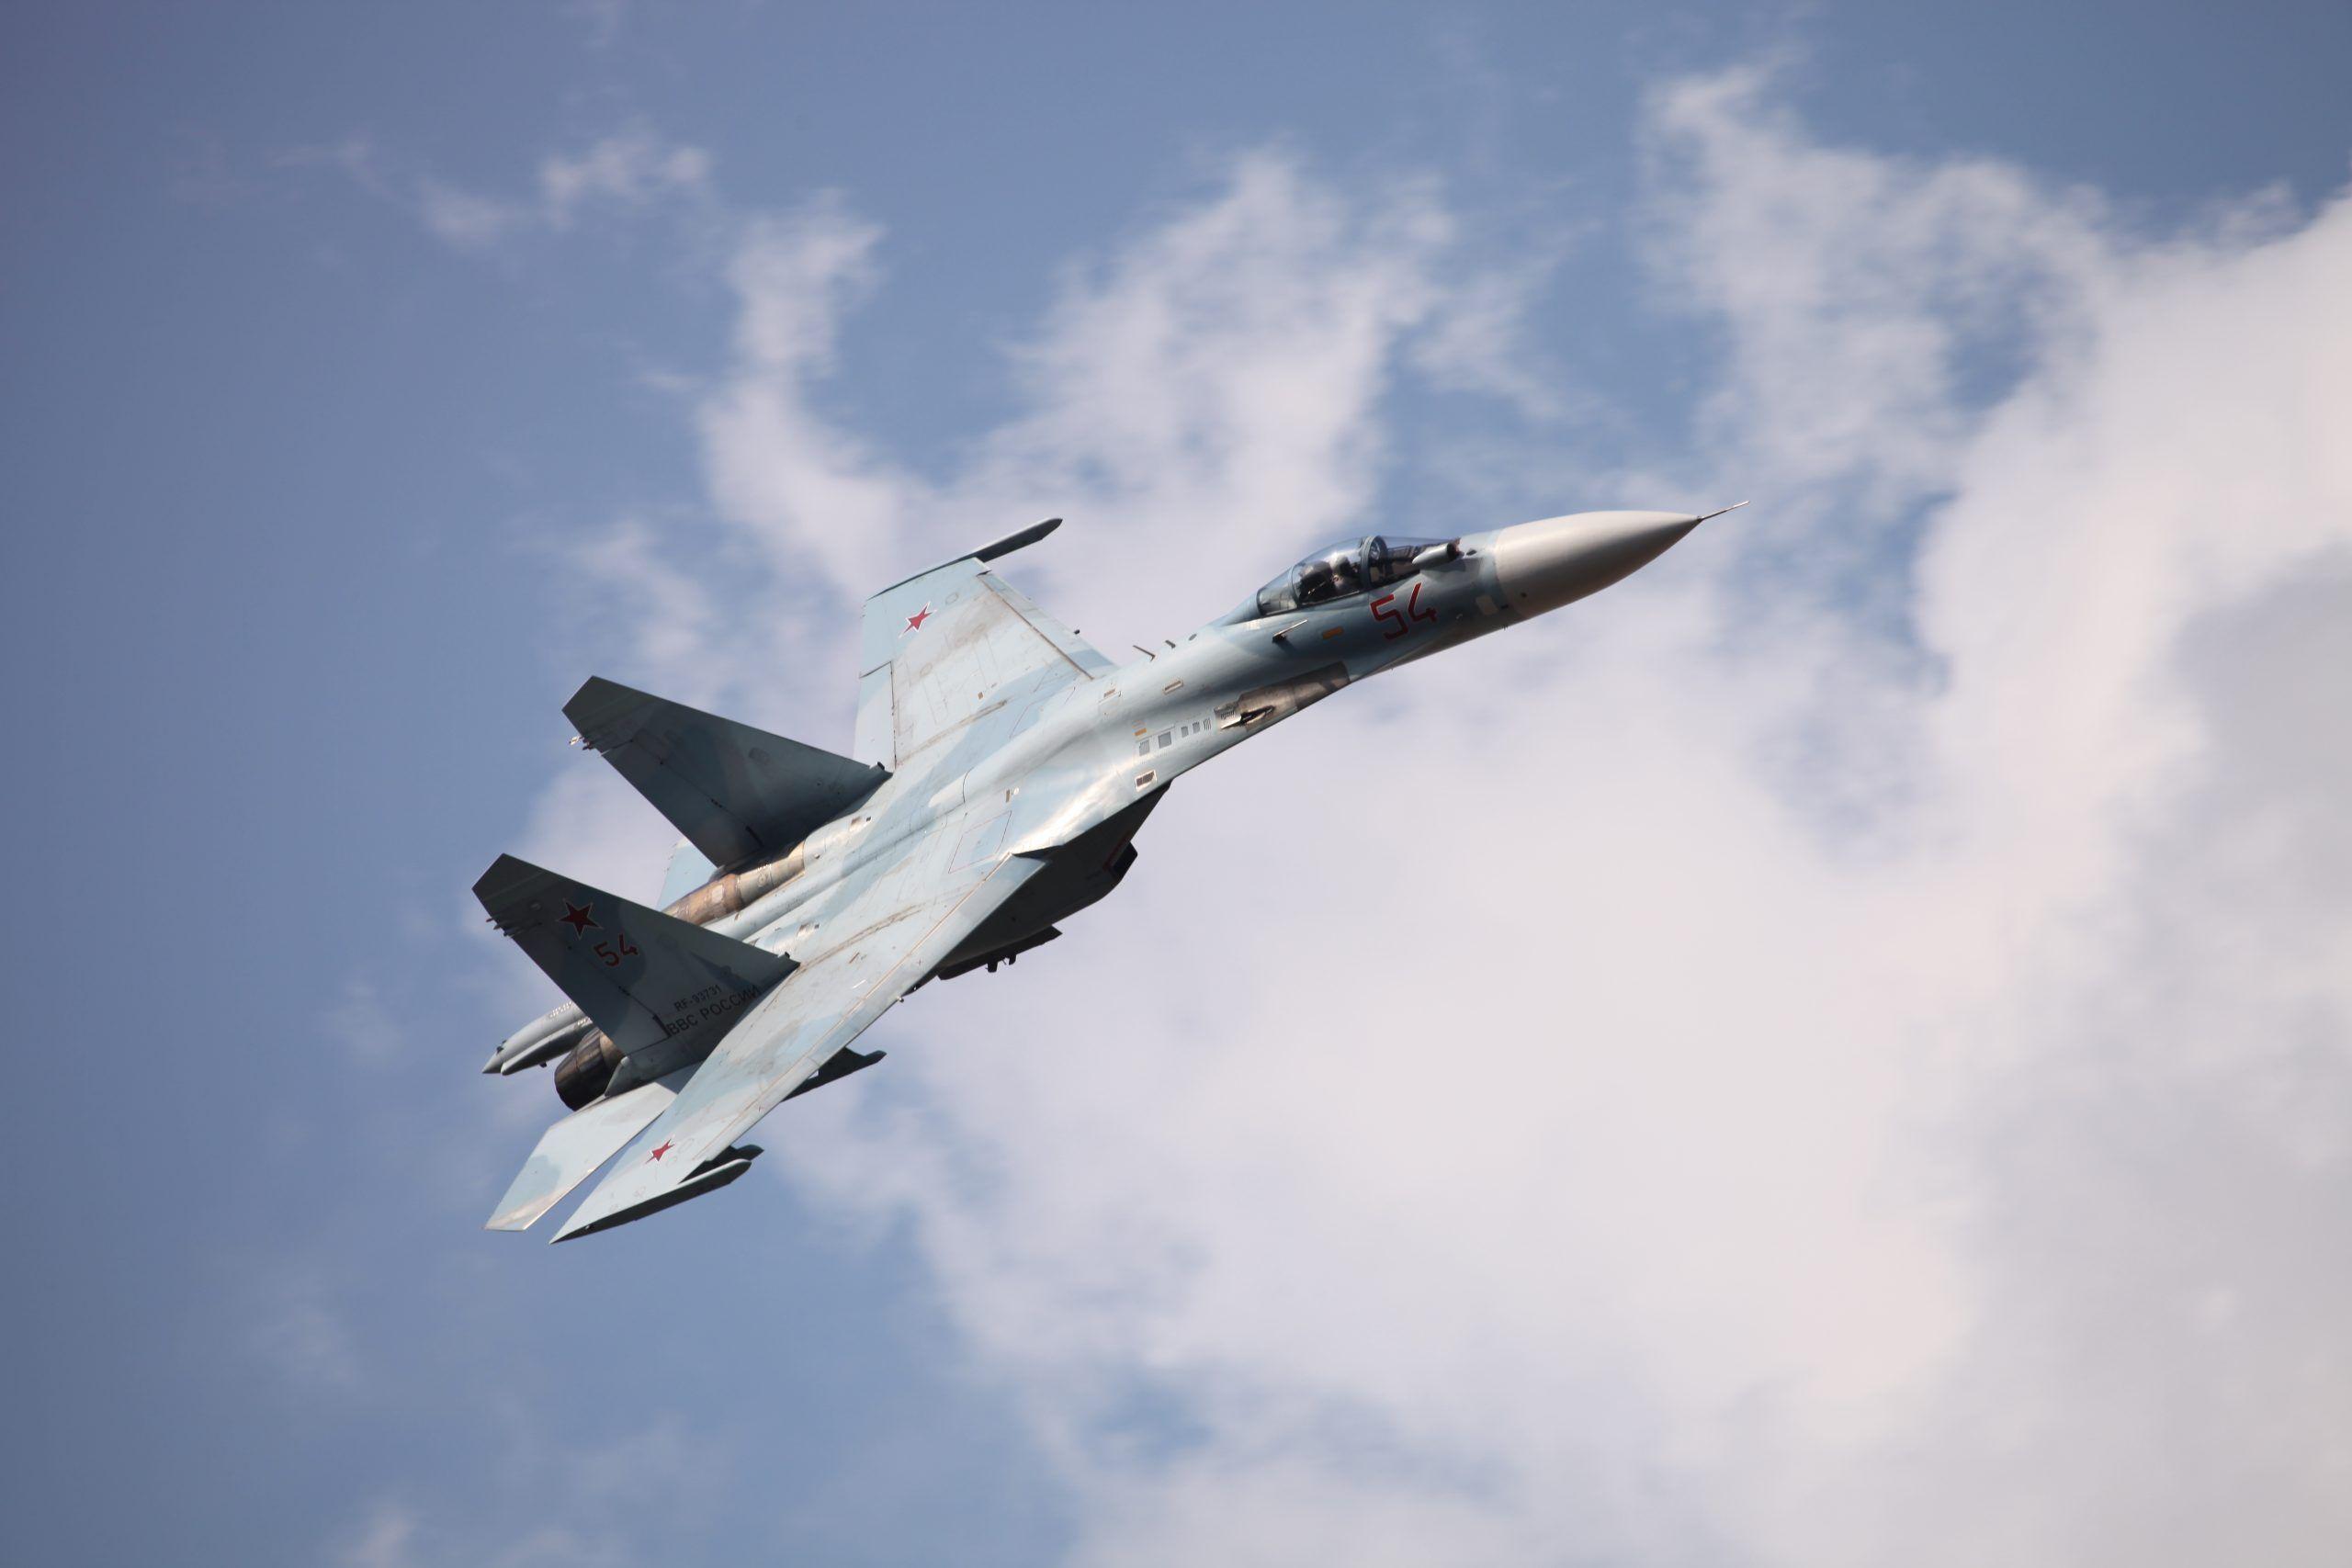 Jet russo abbattuto da Ankara, Putin: 'Ci saranno gravi conseguenze'